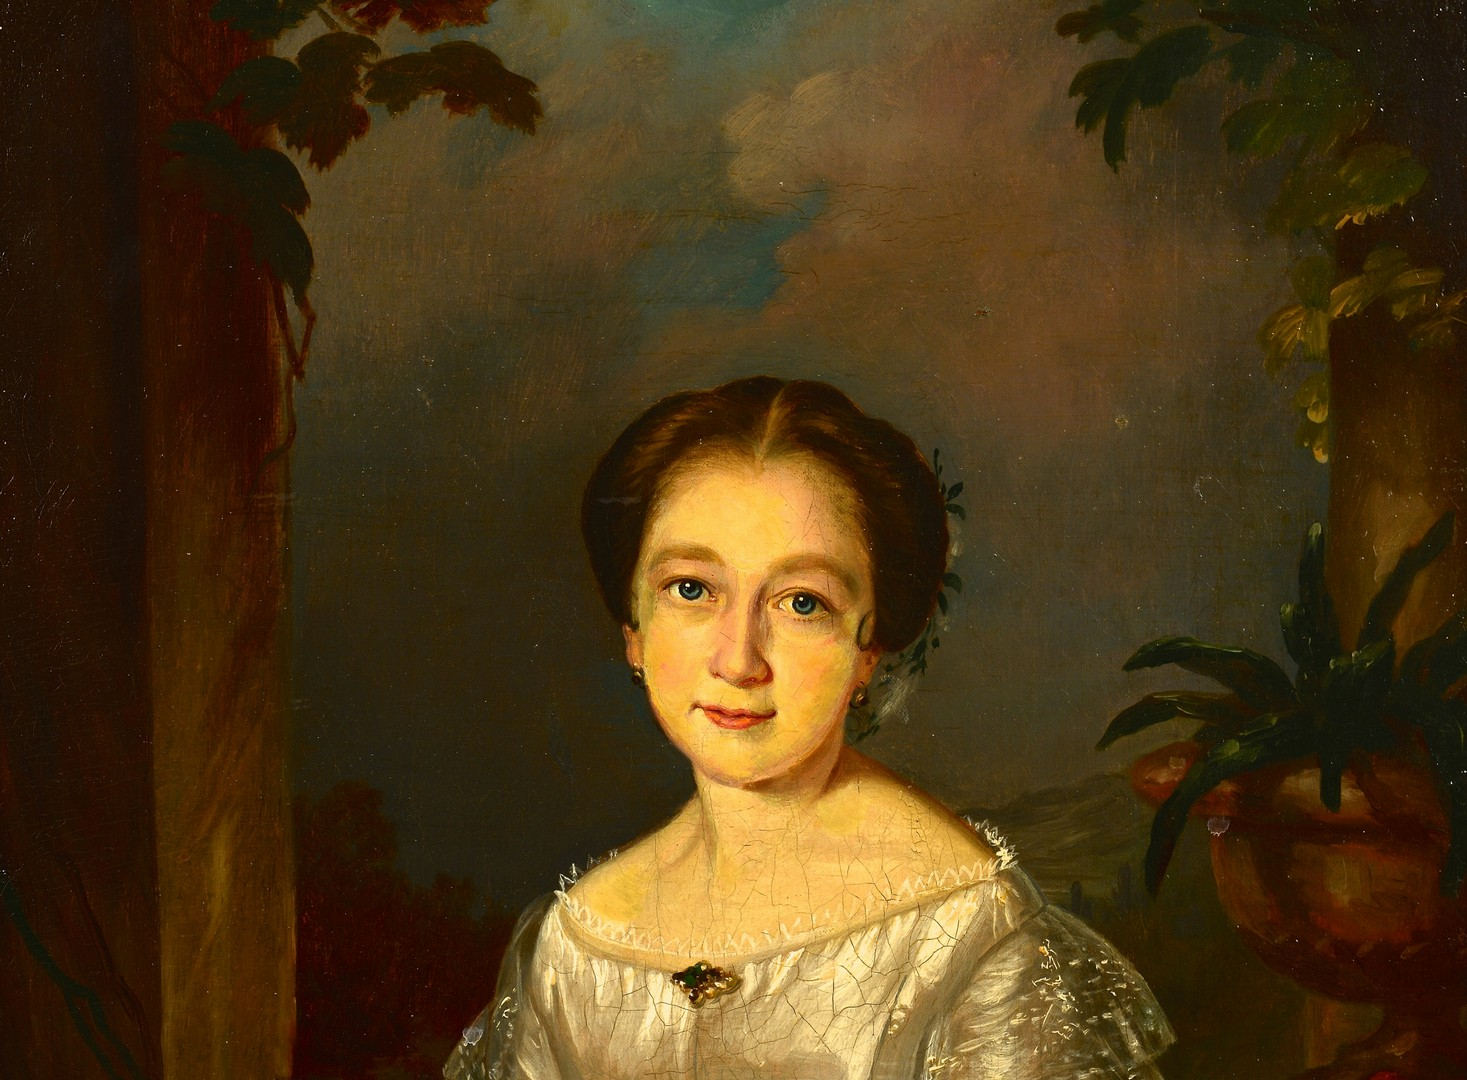 Lot 168: Southern School, 19th c. Portrait of a Lady